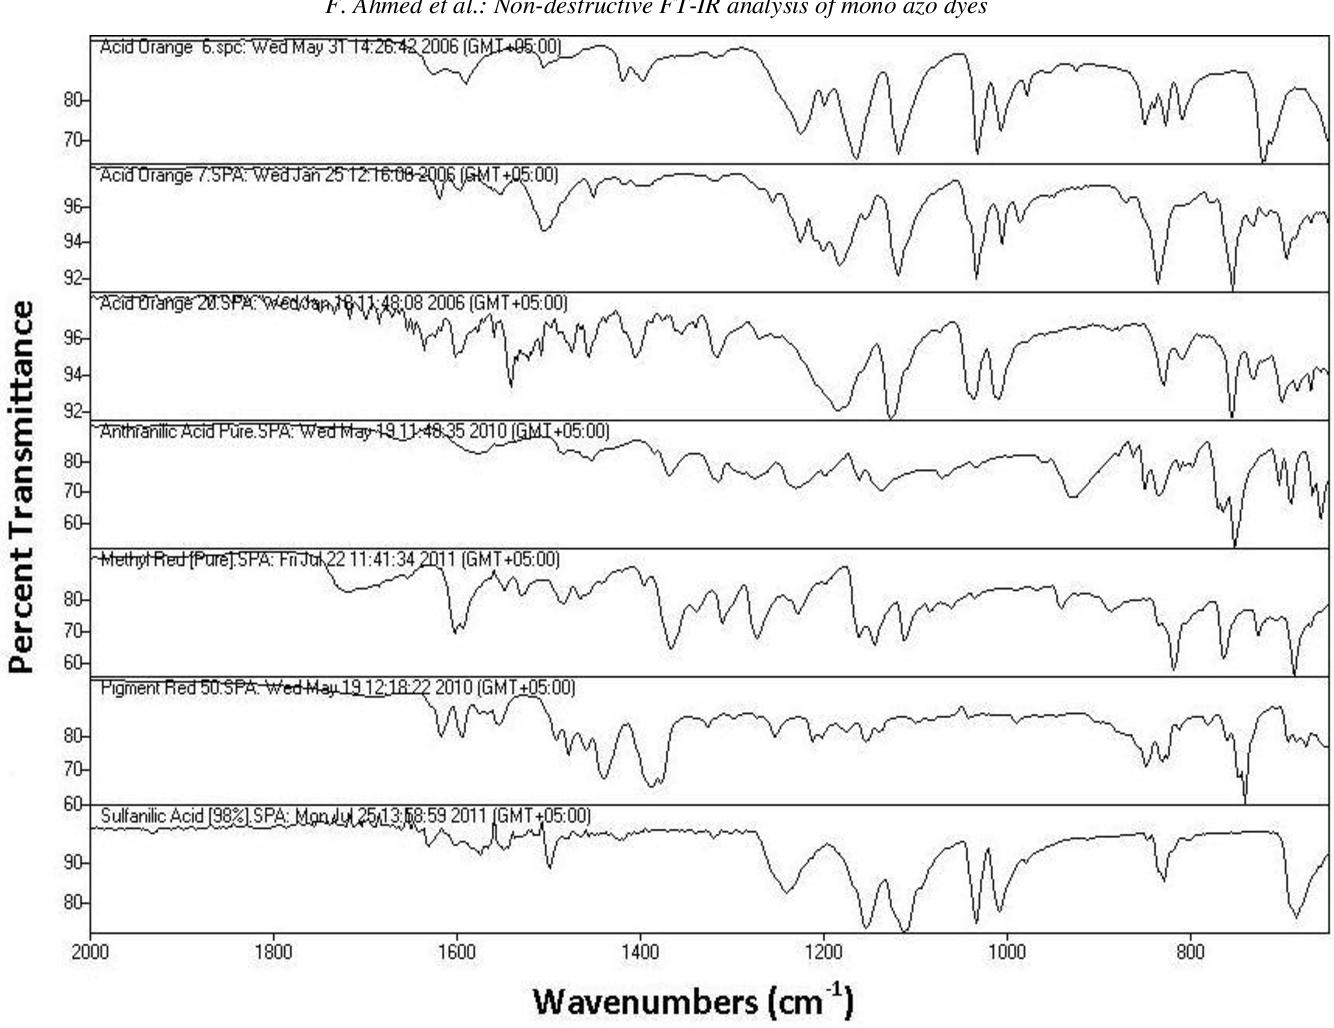 PDF] Non-destructive FTIR analysis of mono azo dyes - Semantic Scholar